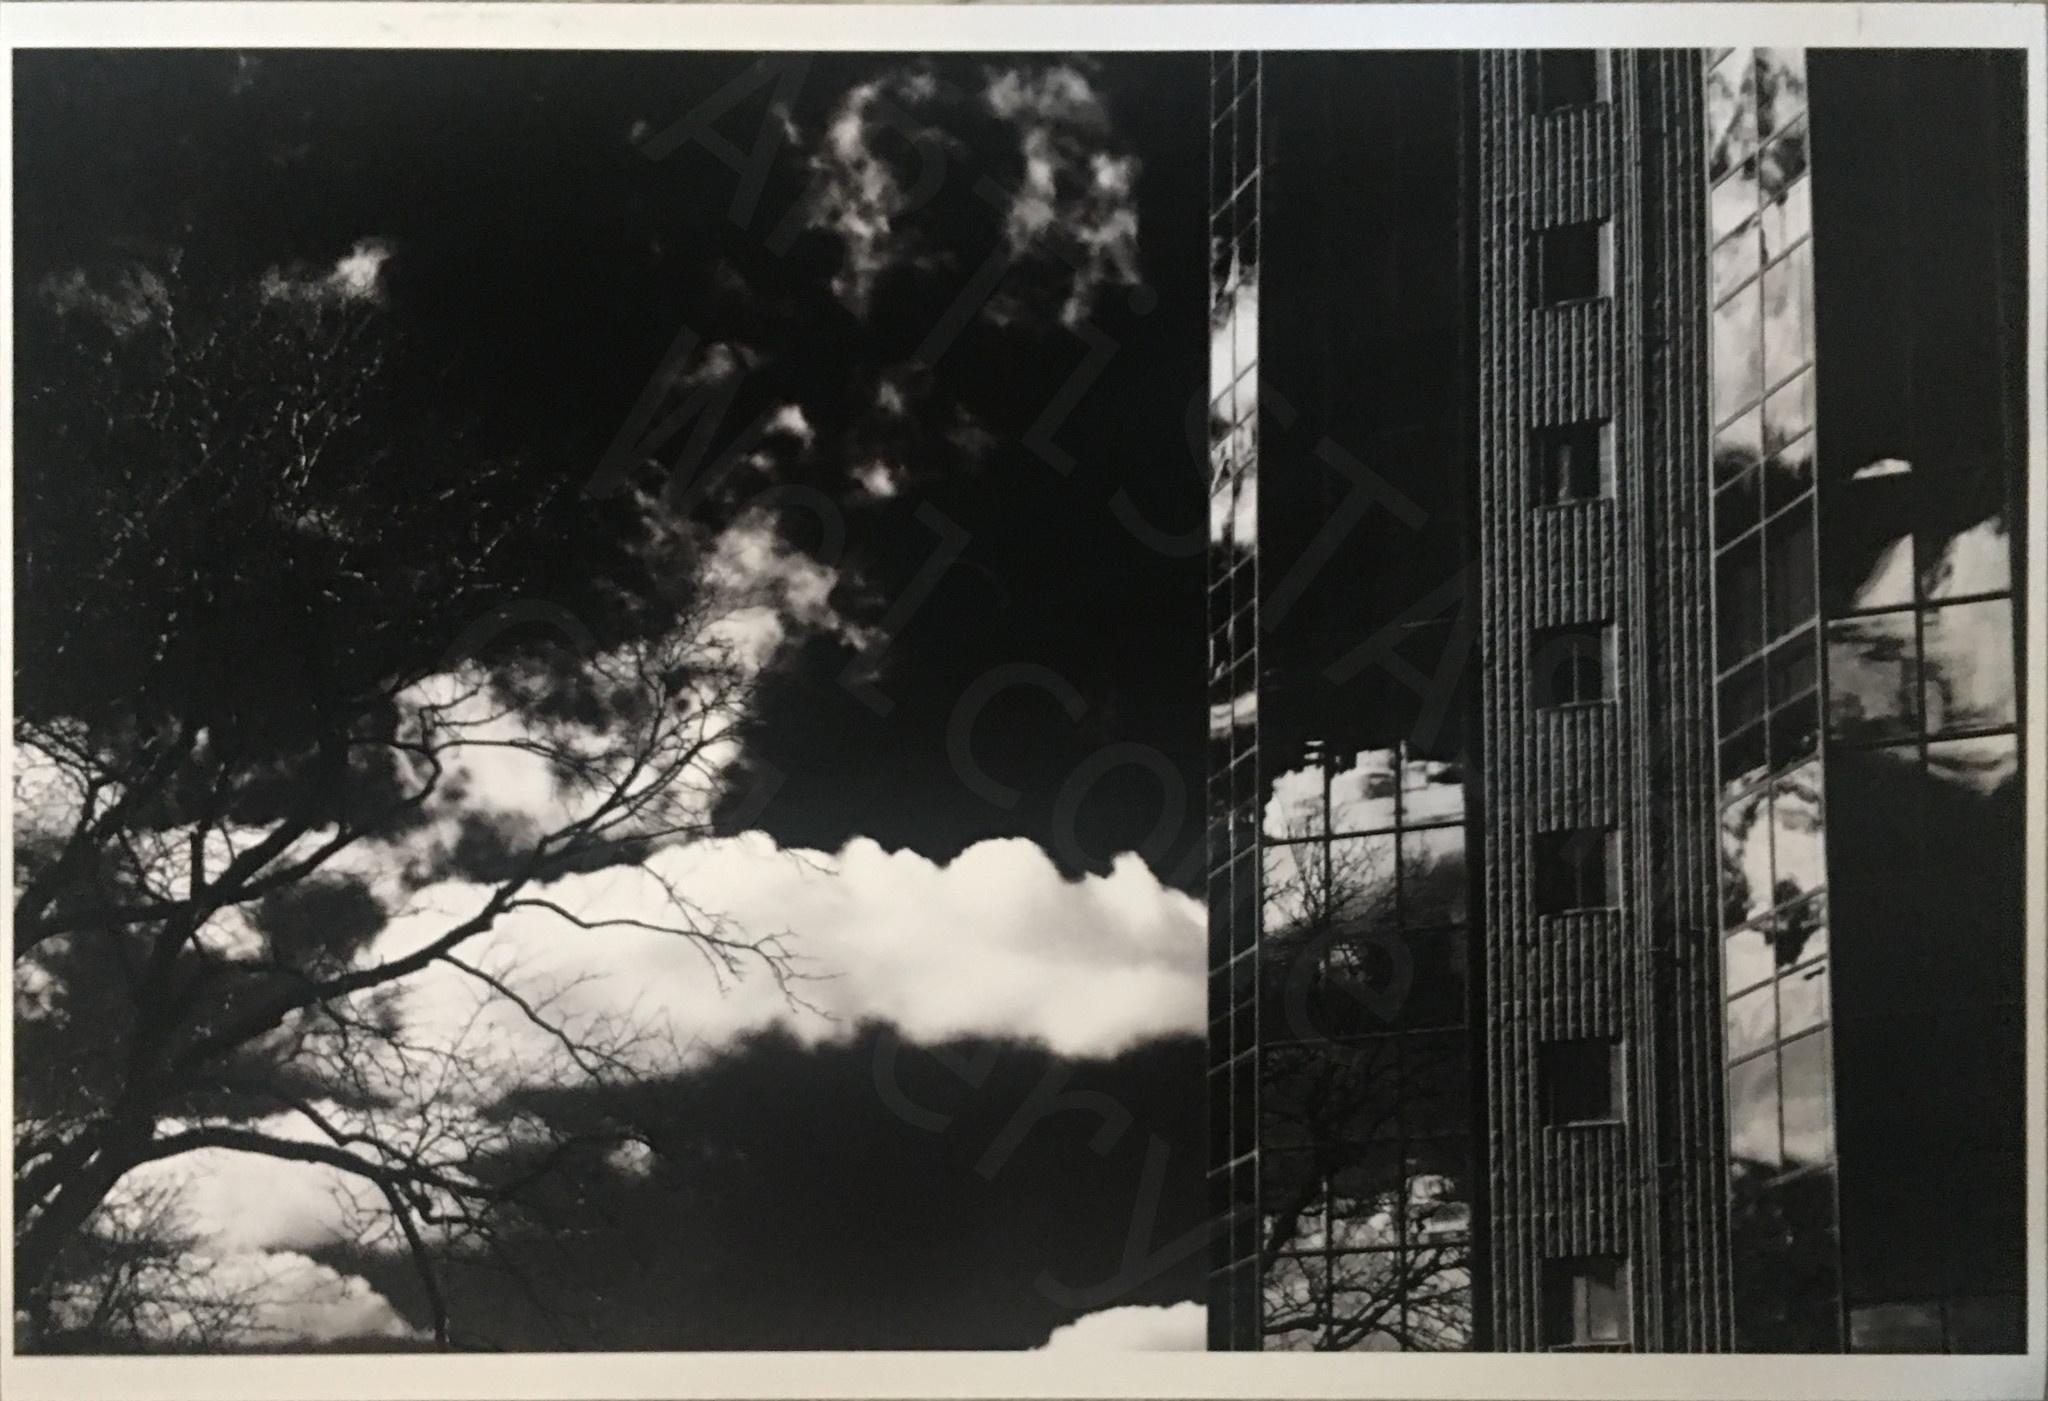 Michael Ray Yost Reflecting on Nature